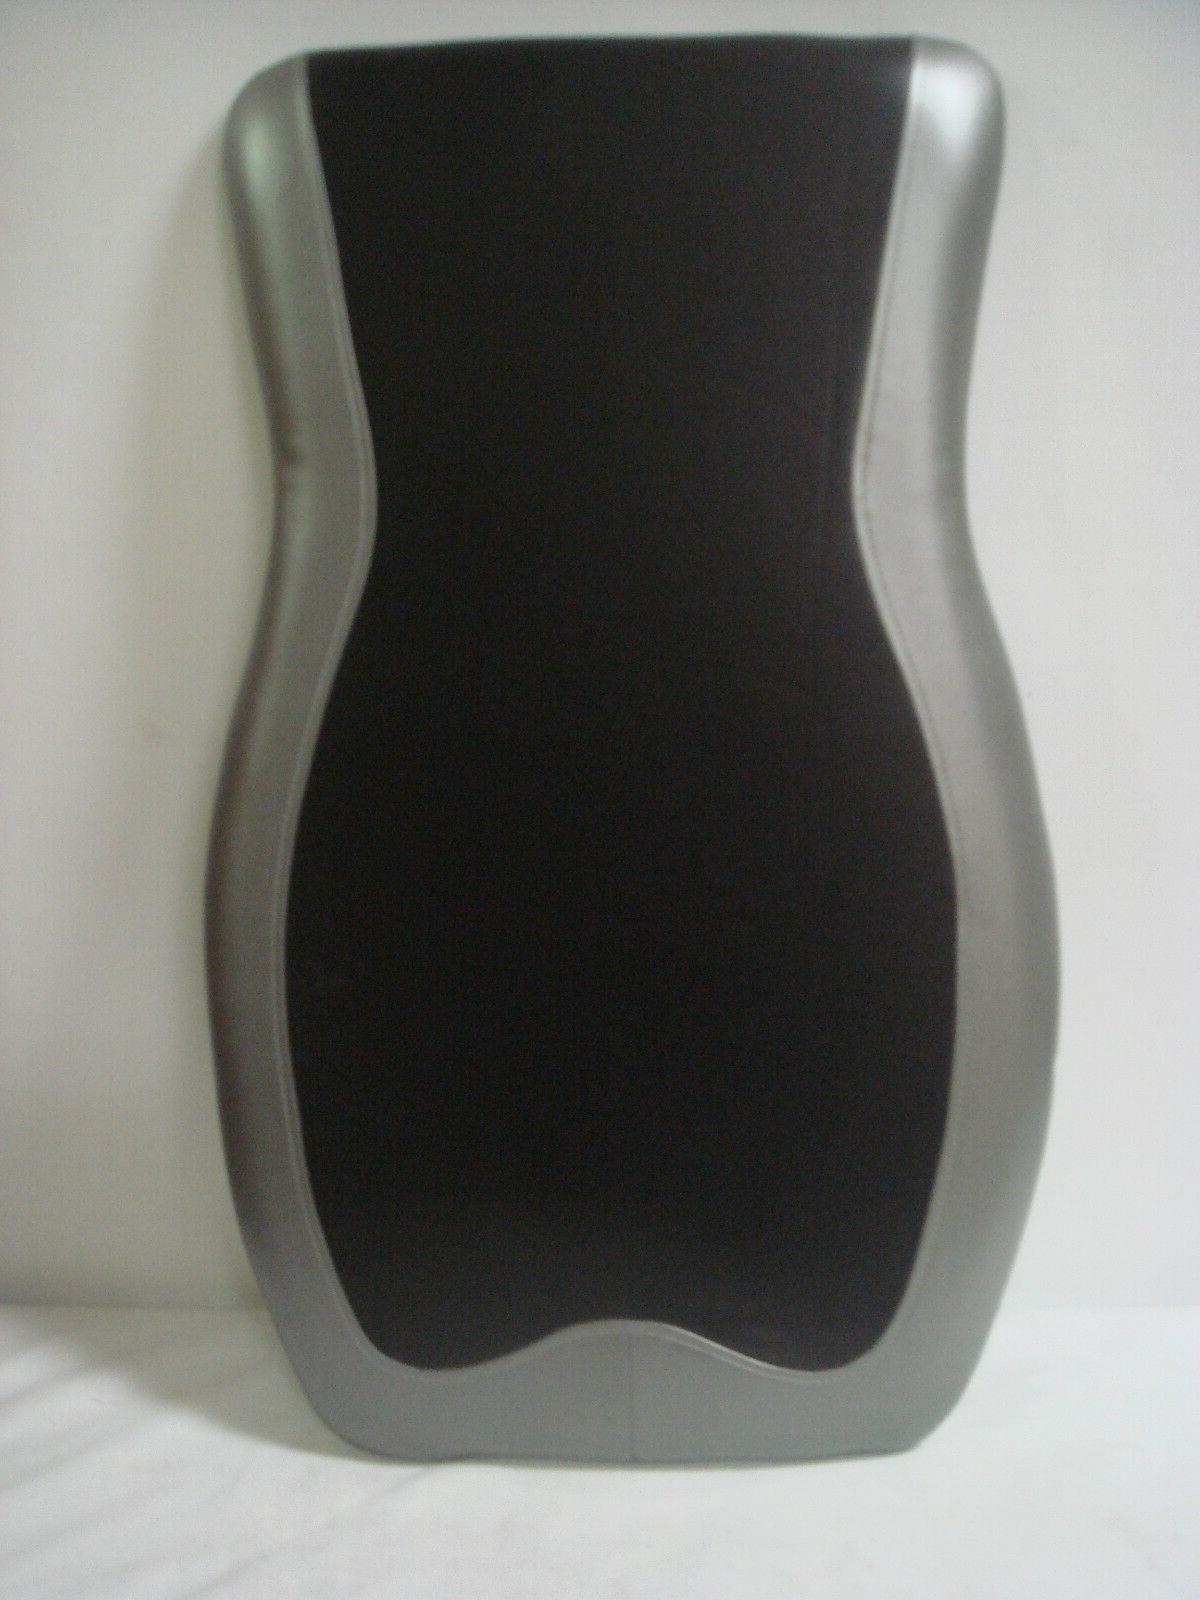 inversion table backrest pad